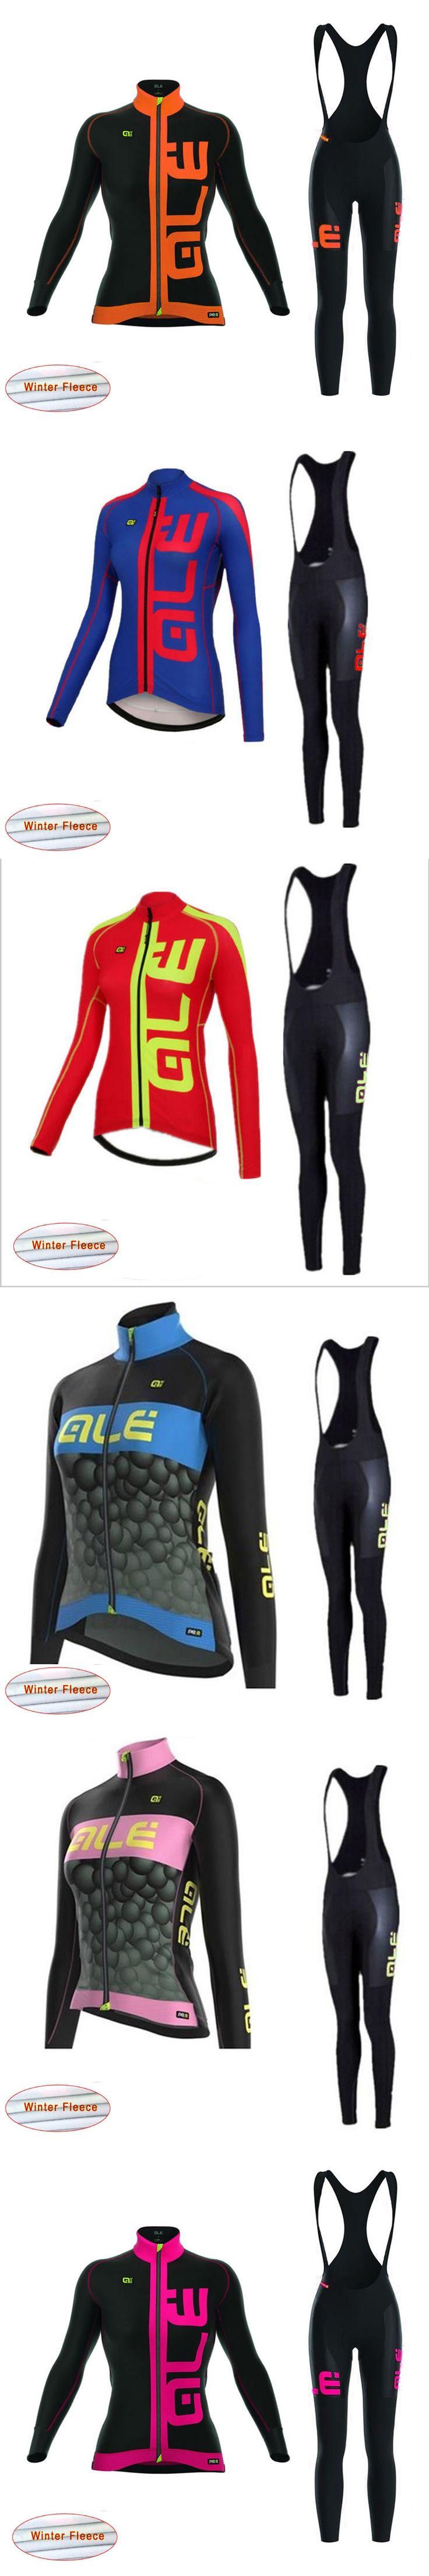 Pro Team ALE 2017 Women Long Sleeve Cycling Jersey Set Thermal Fleece Winter Bike Clothing Ropa Ciclismo China Bib Pants G23